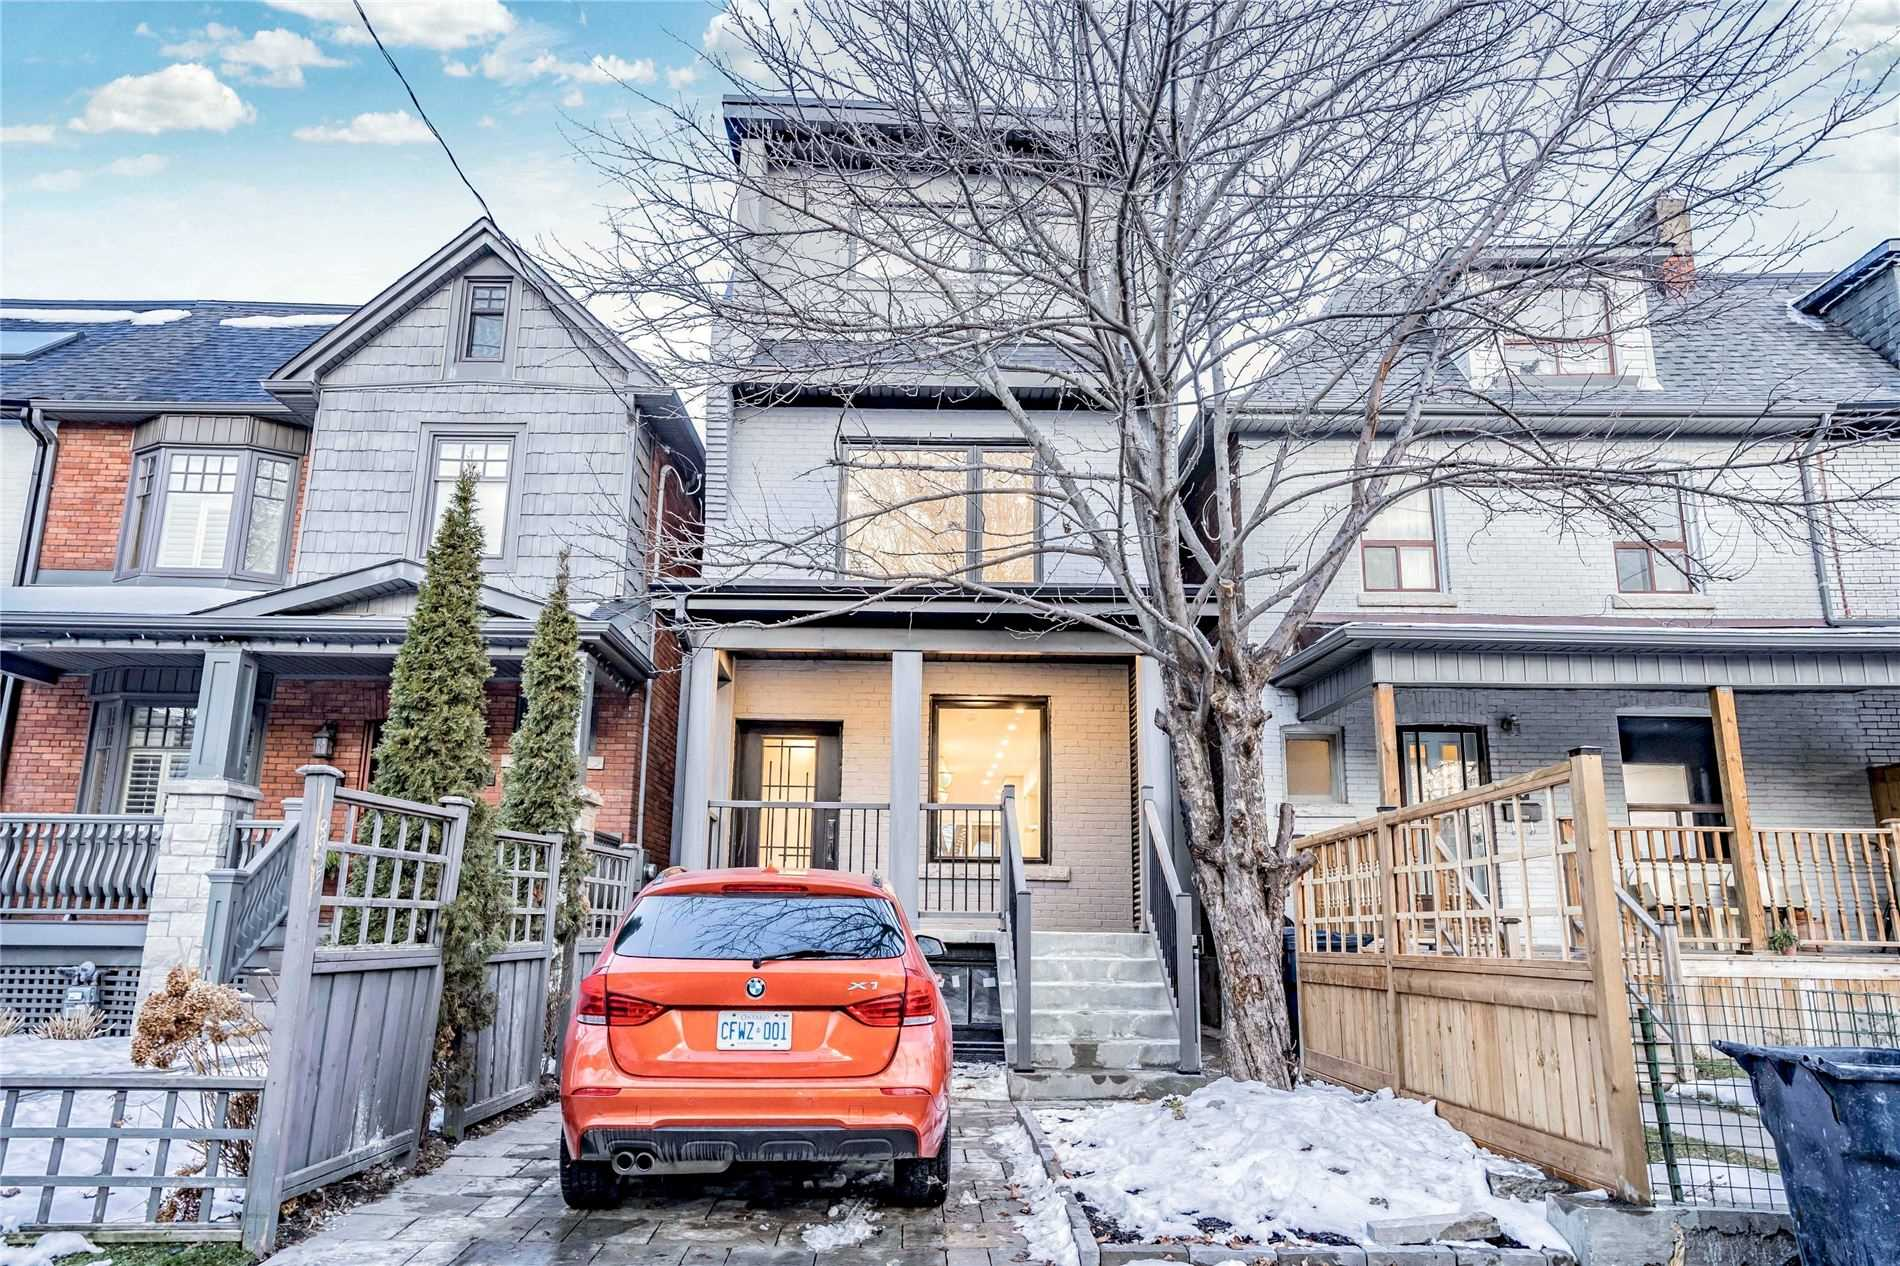 629 Shaw St, Toronto, Ontario M6G3L8, 3 Bedrooms Bedrooms, 8 Rooms Rooms,4 BathroomsBathrooms,Detached,For Sale,Shaw,C5113720